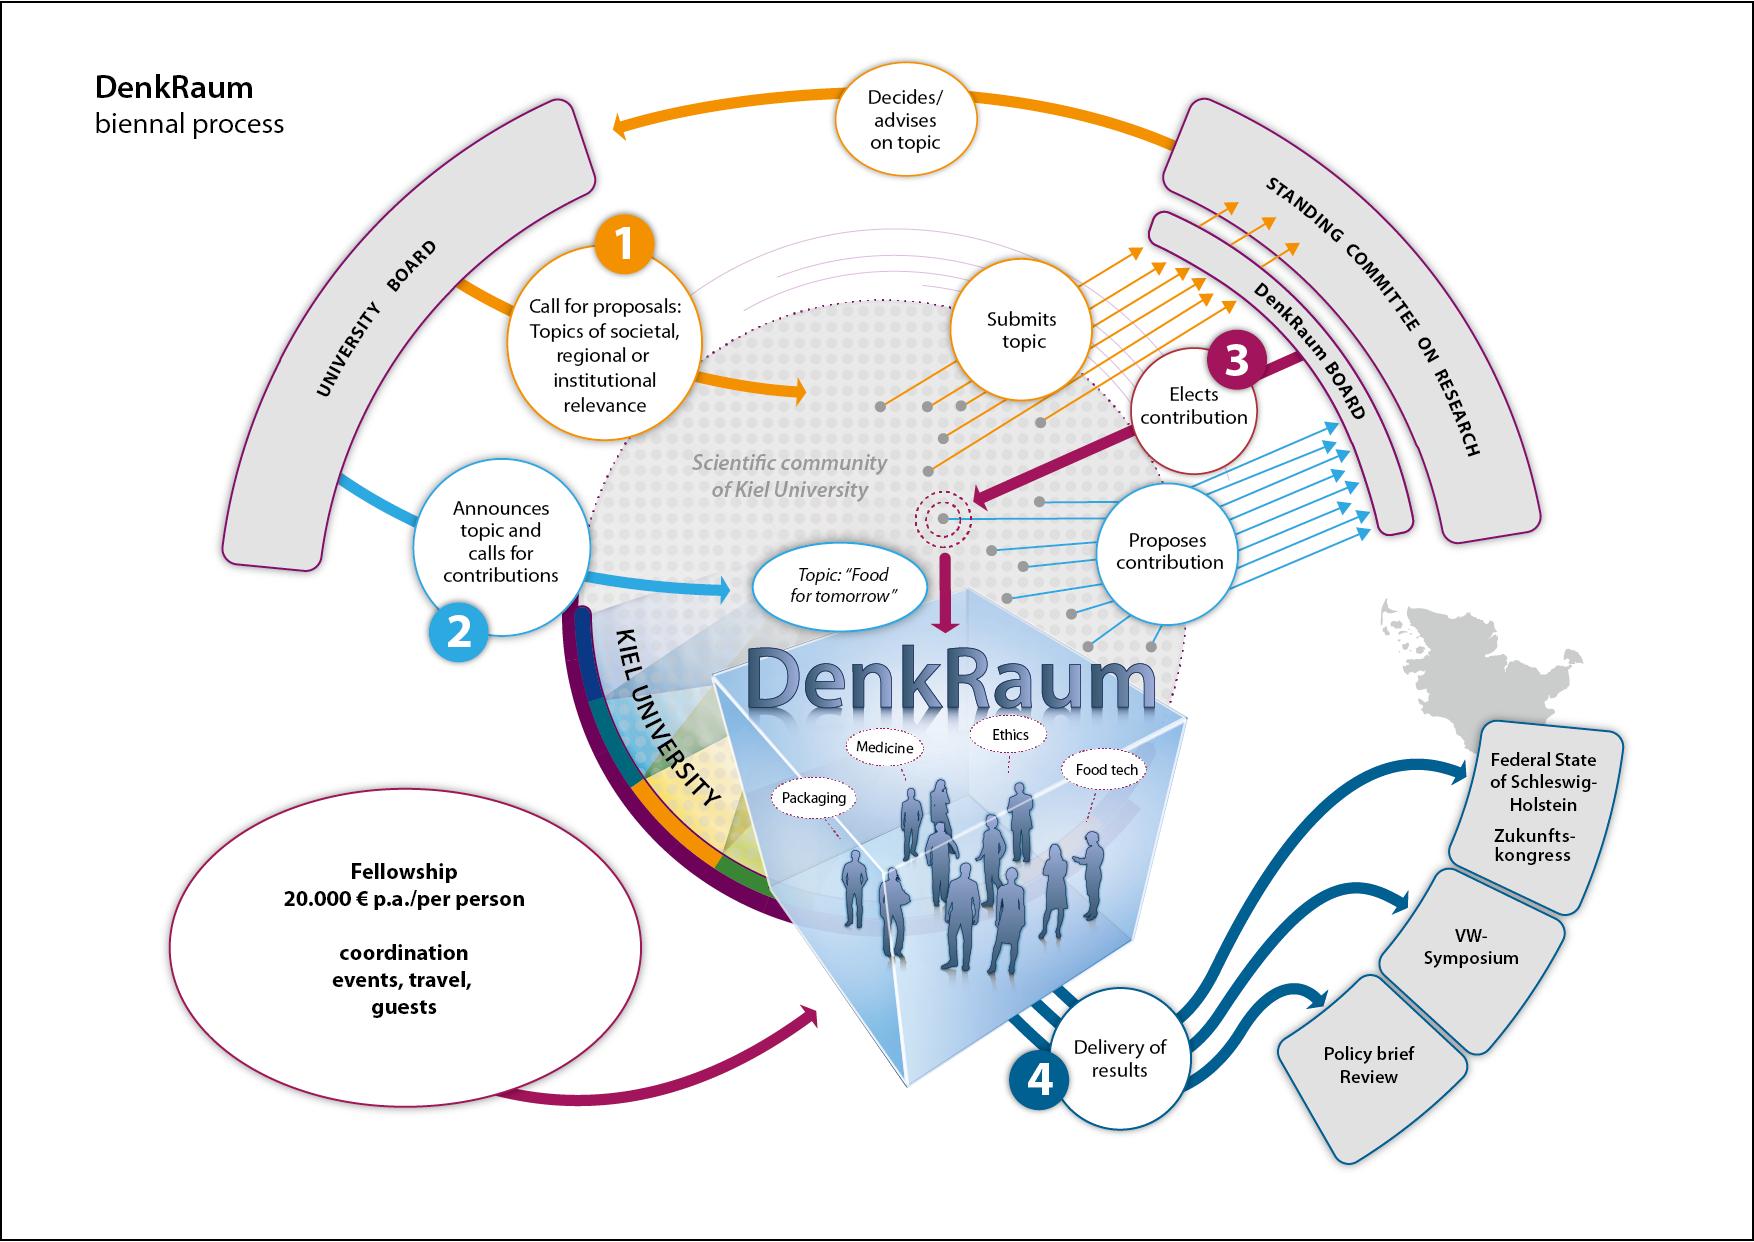 Graphic: KITE:DenkRaum - biennal process